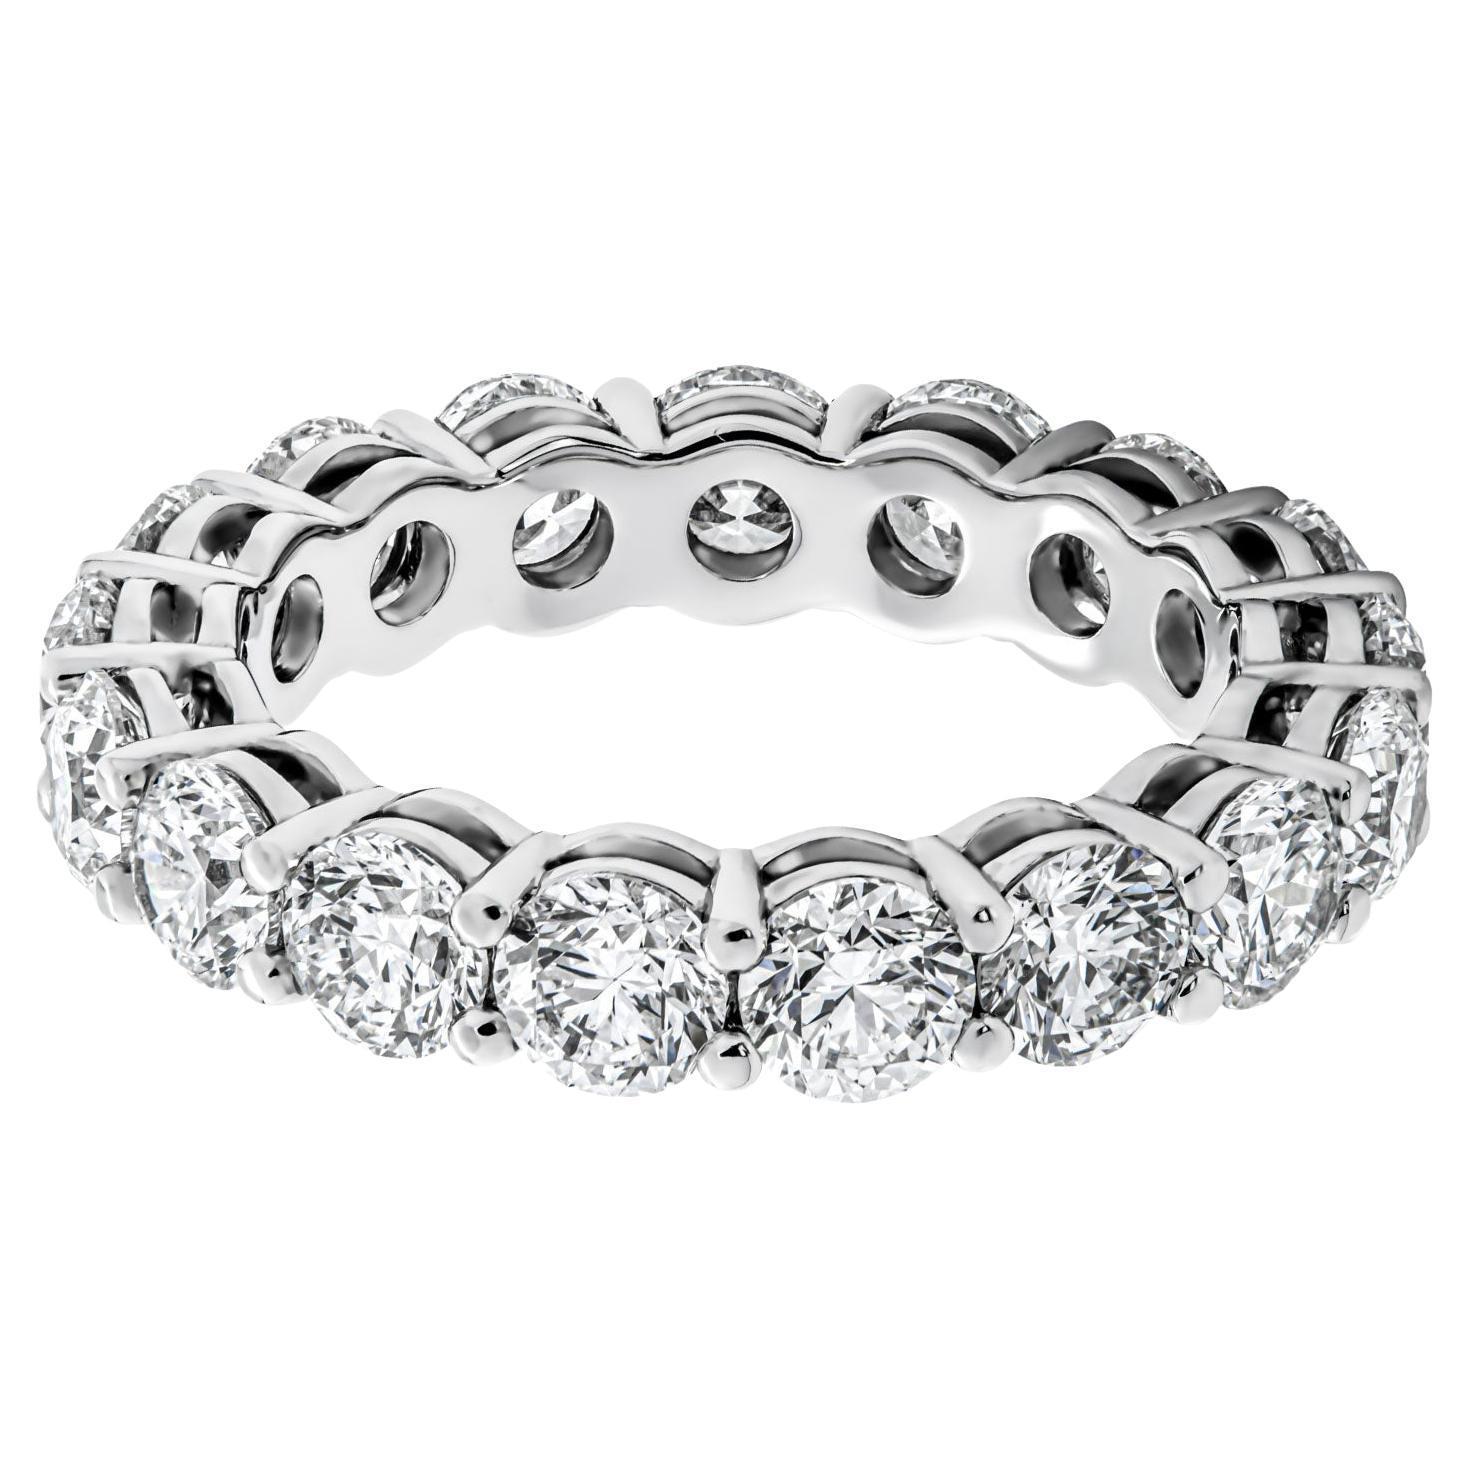 Eternity Band with 3.77 Carat Round Cut Diamonds